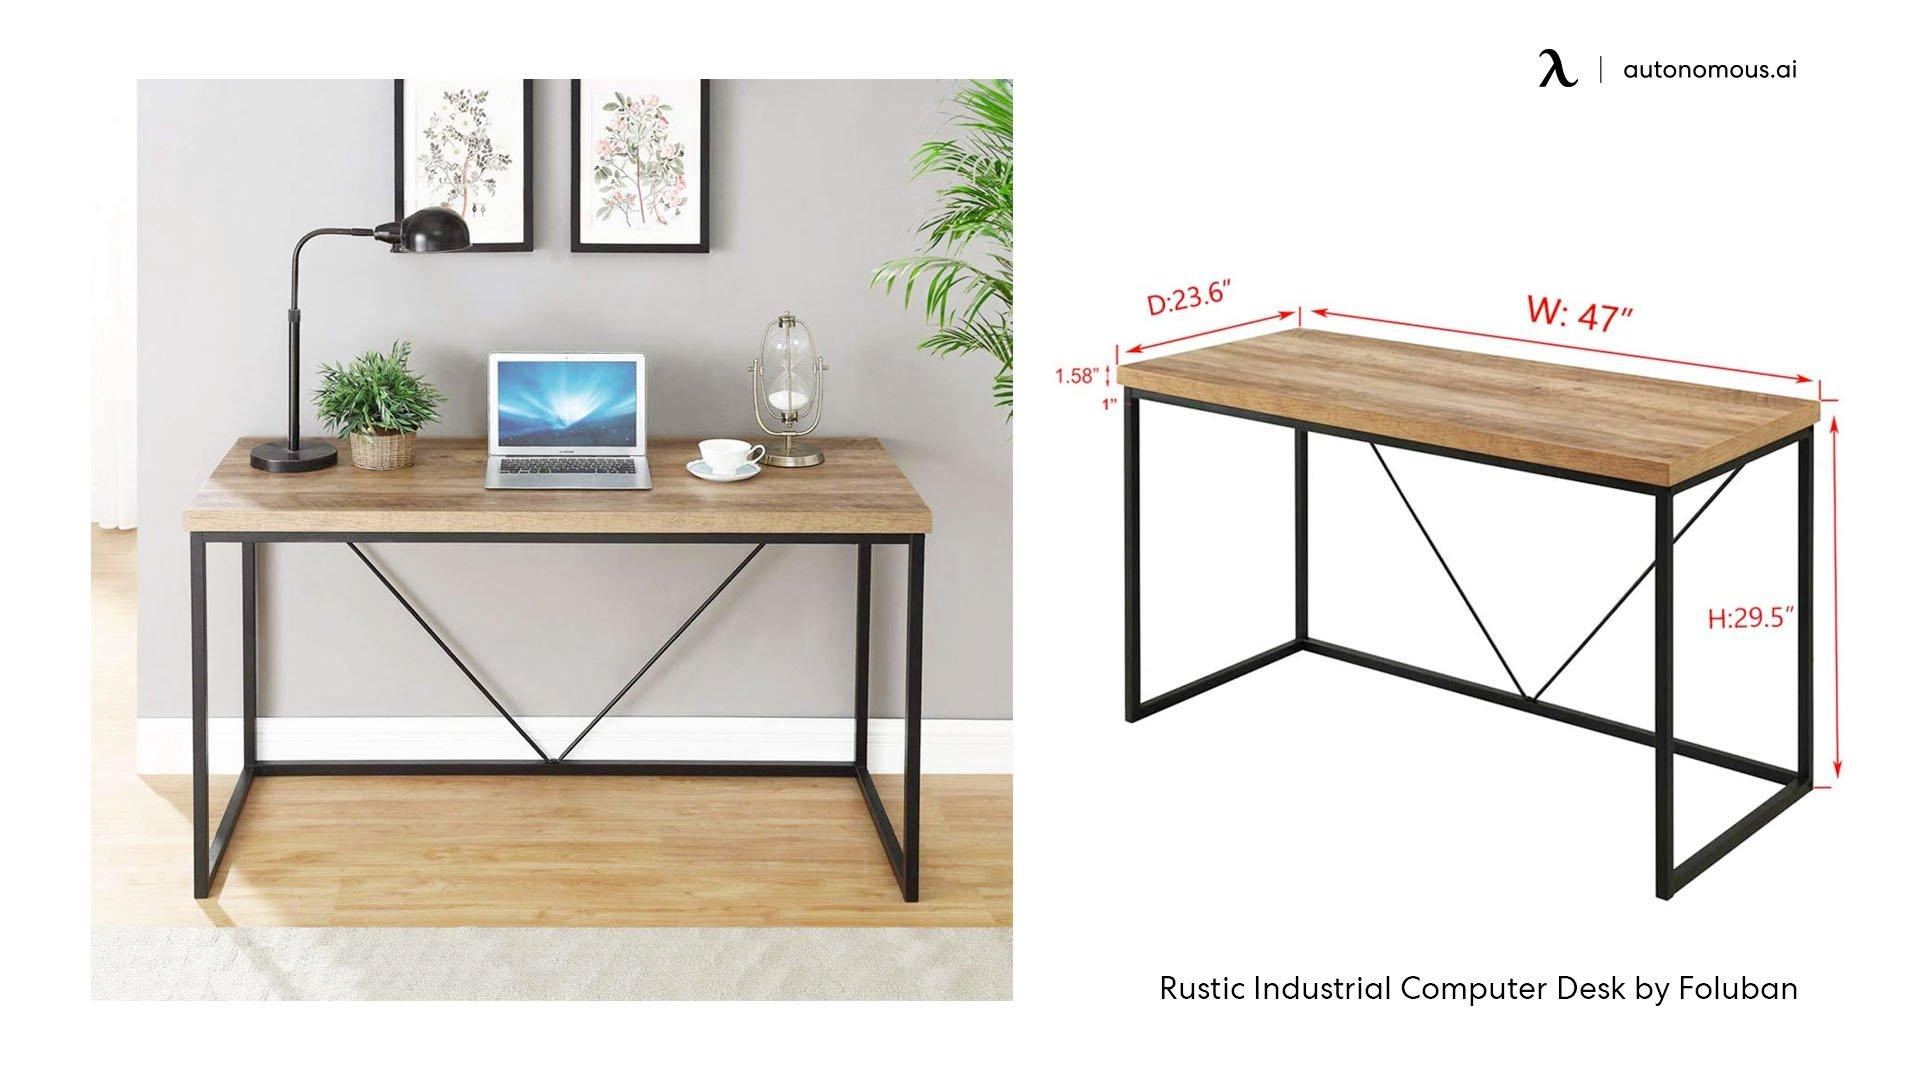 Rustic Industrial Computer Desk by Foluban